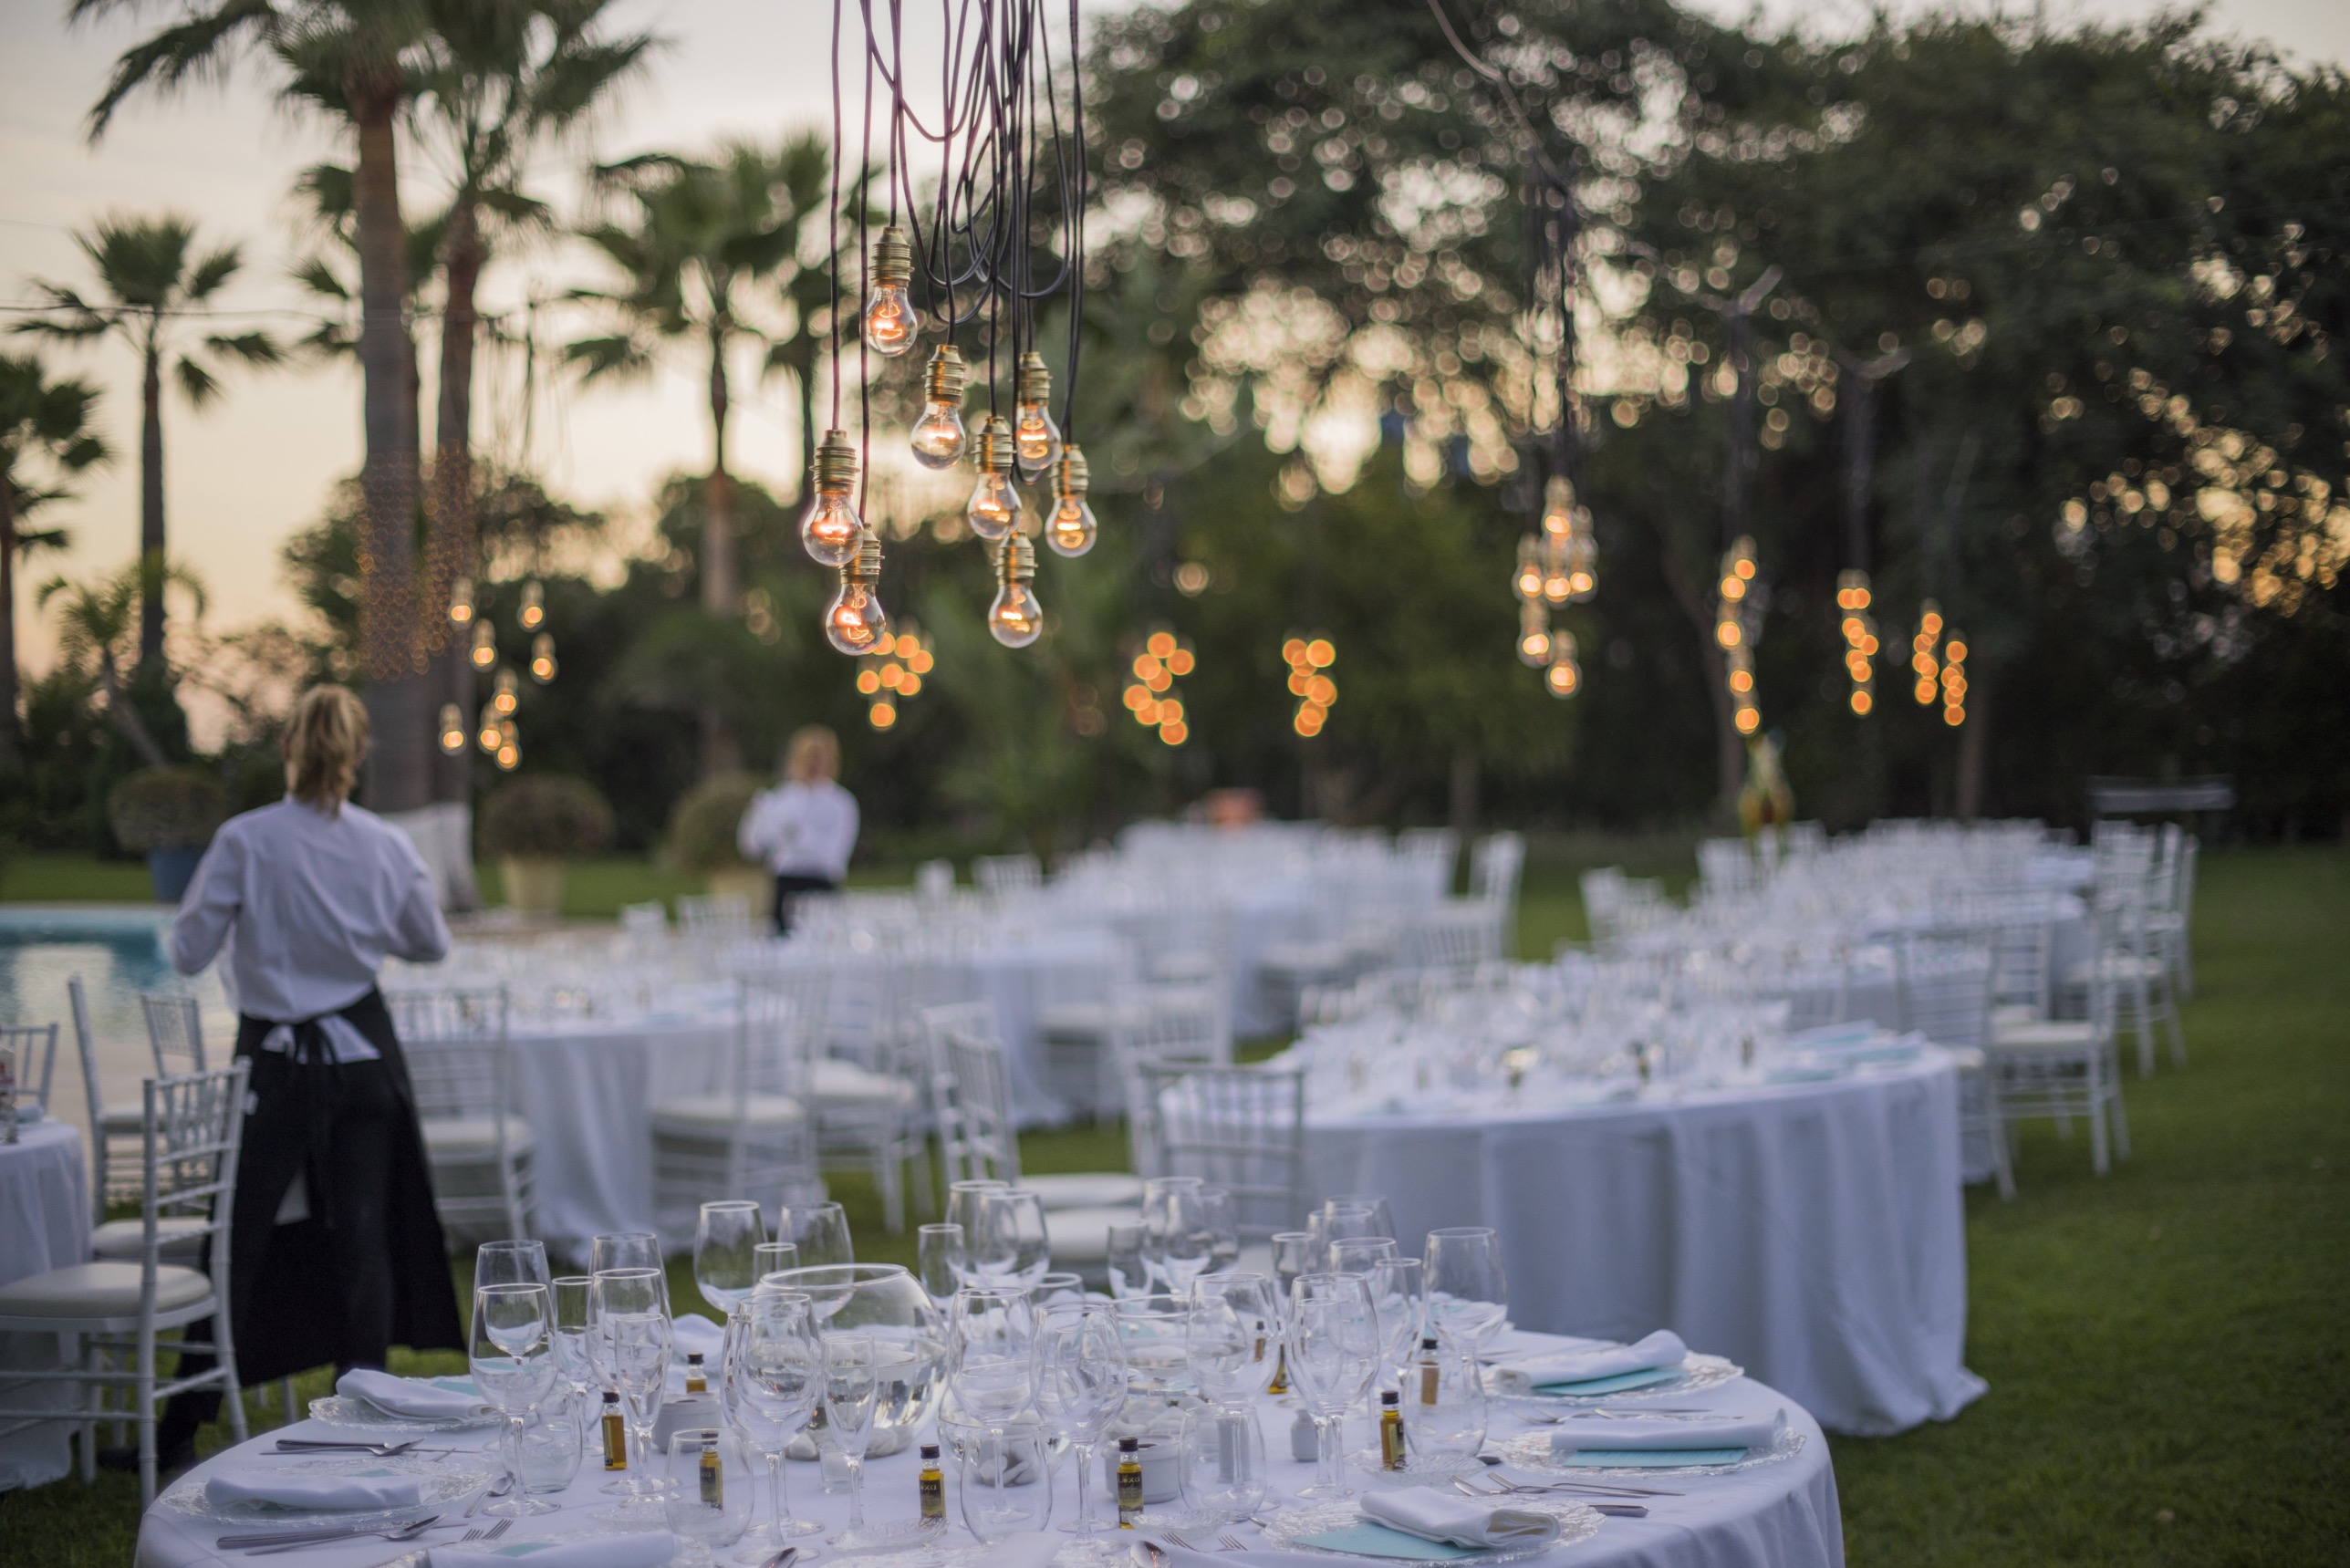 Si-Quiero-Wedding-Planner-By-Sira-Antequera-Bodas-Málaga-Marbella-Miami- Nicole-Guille-7